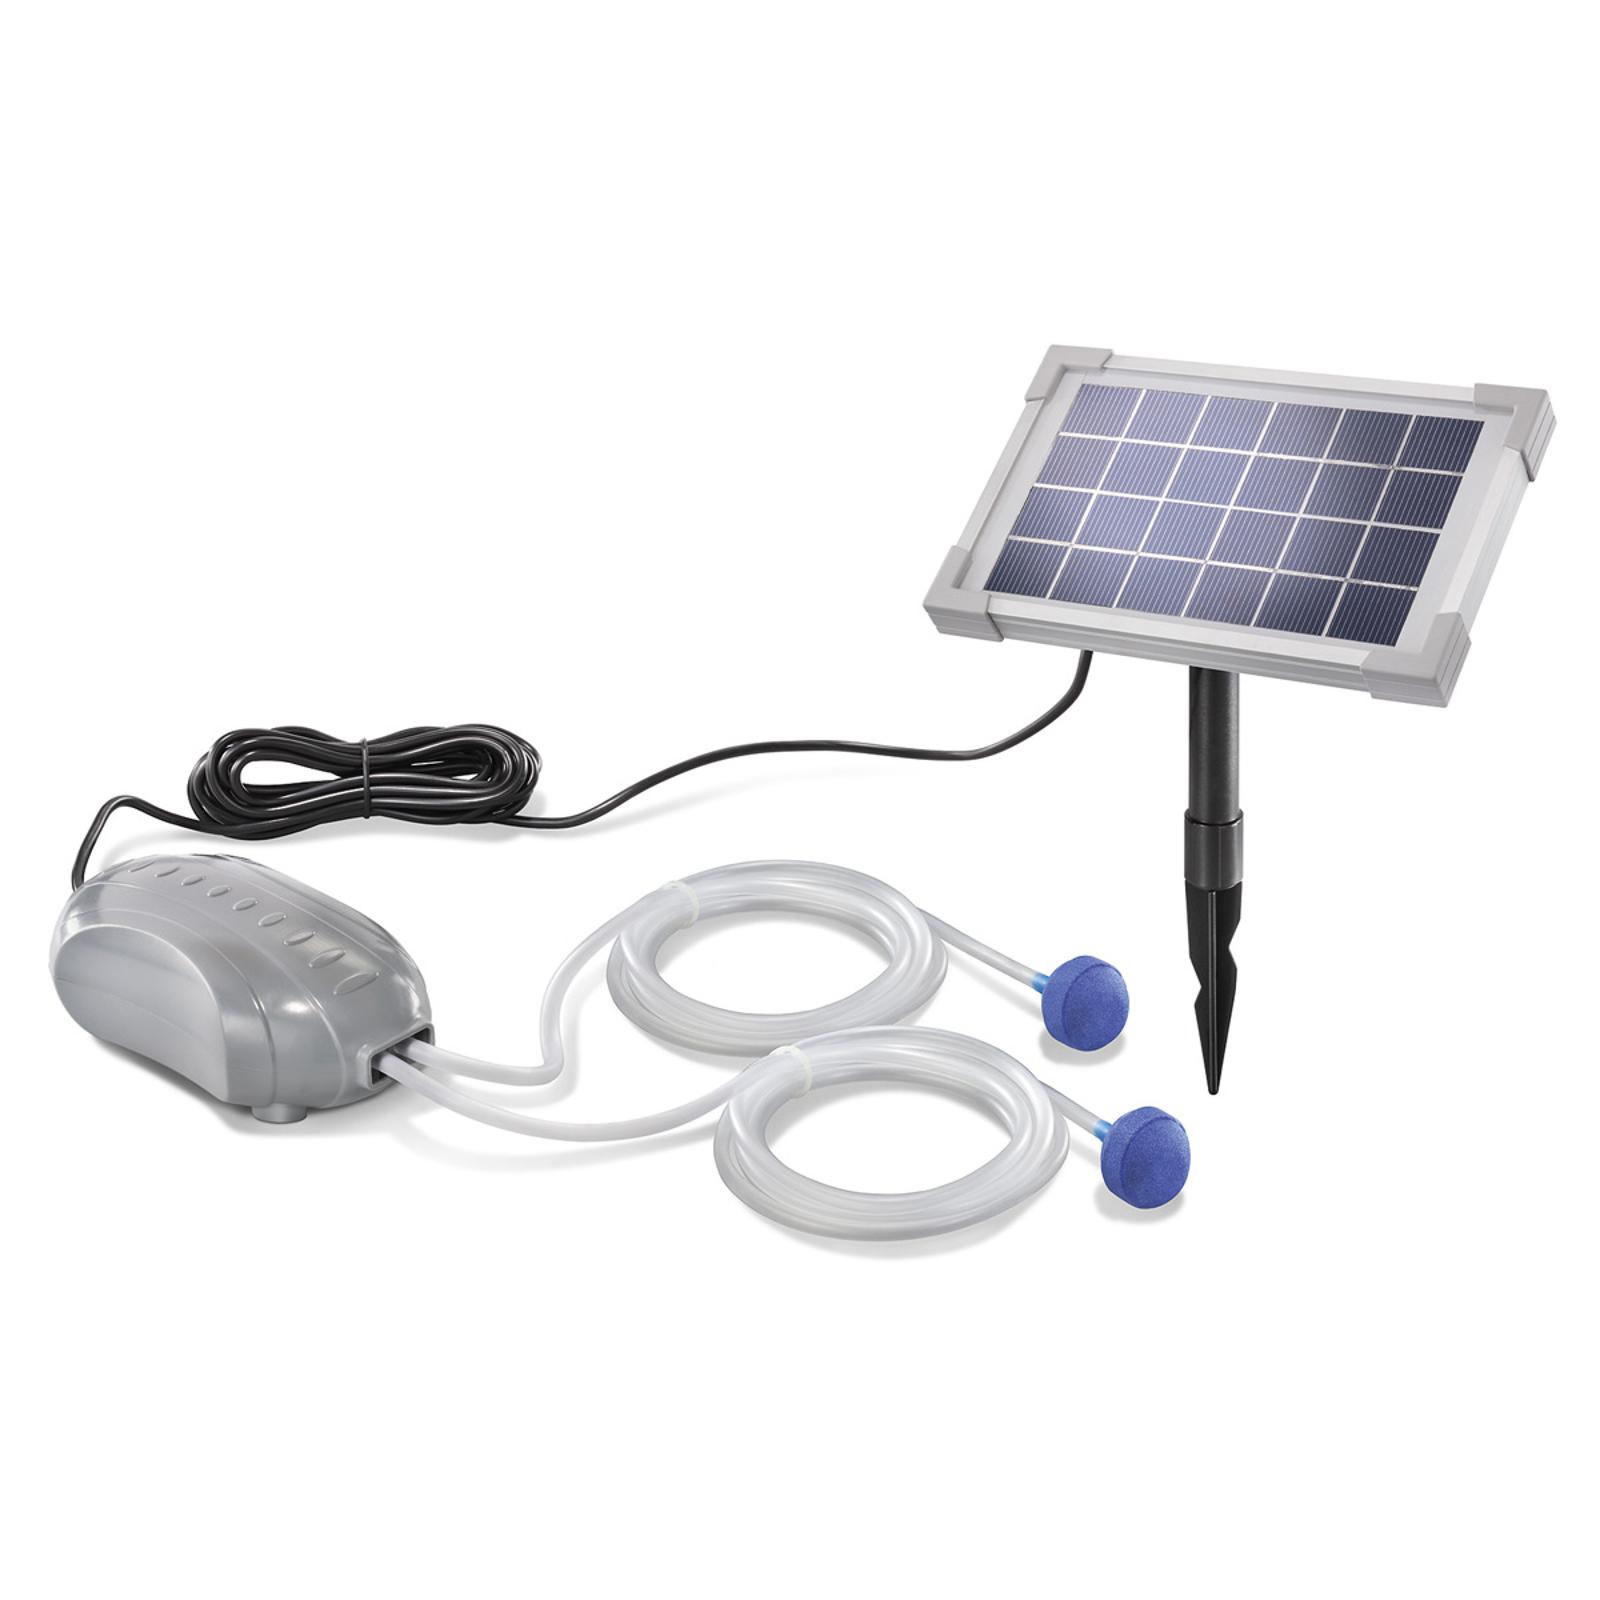 Duo Air - aeratore idrico a energia solare